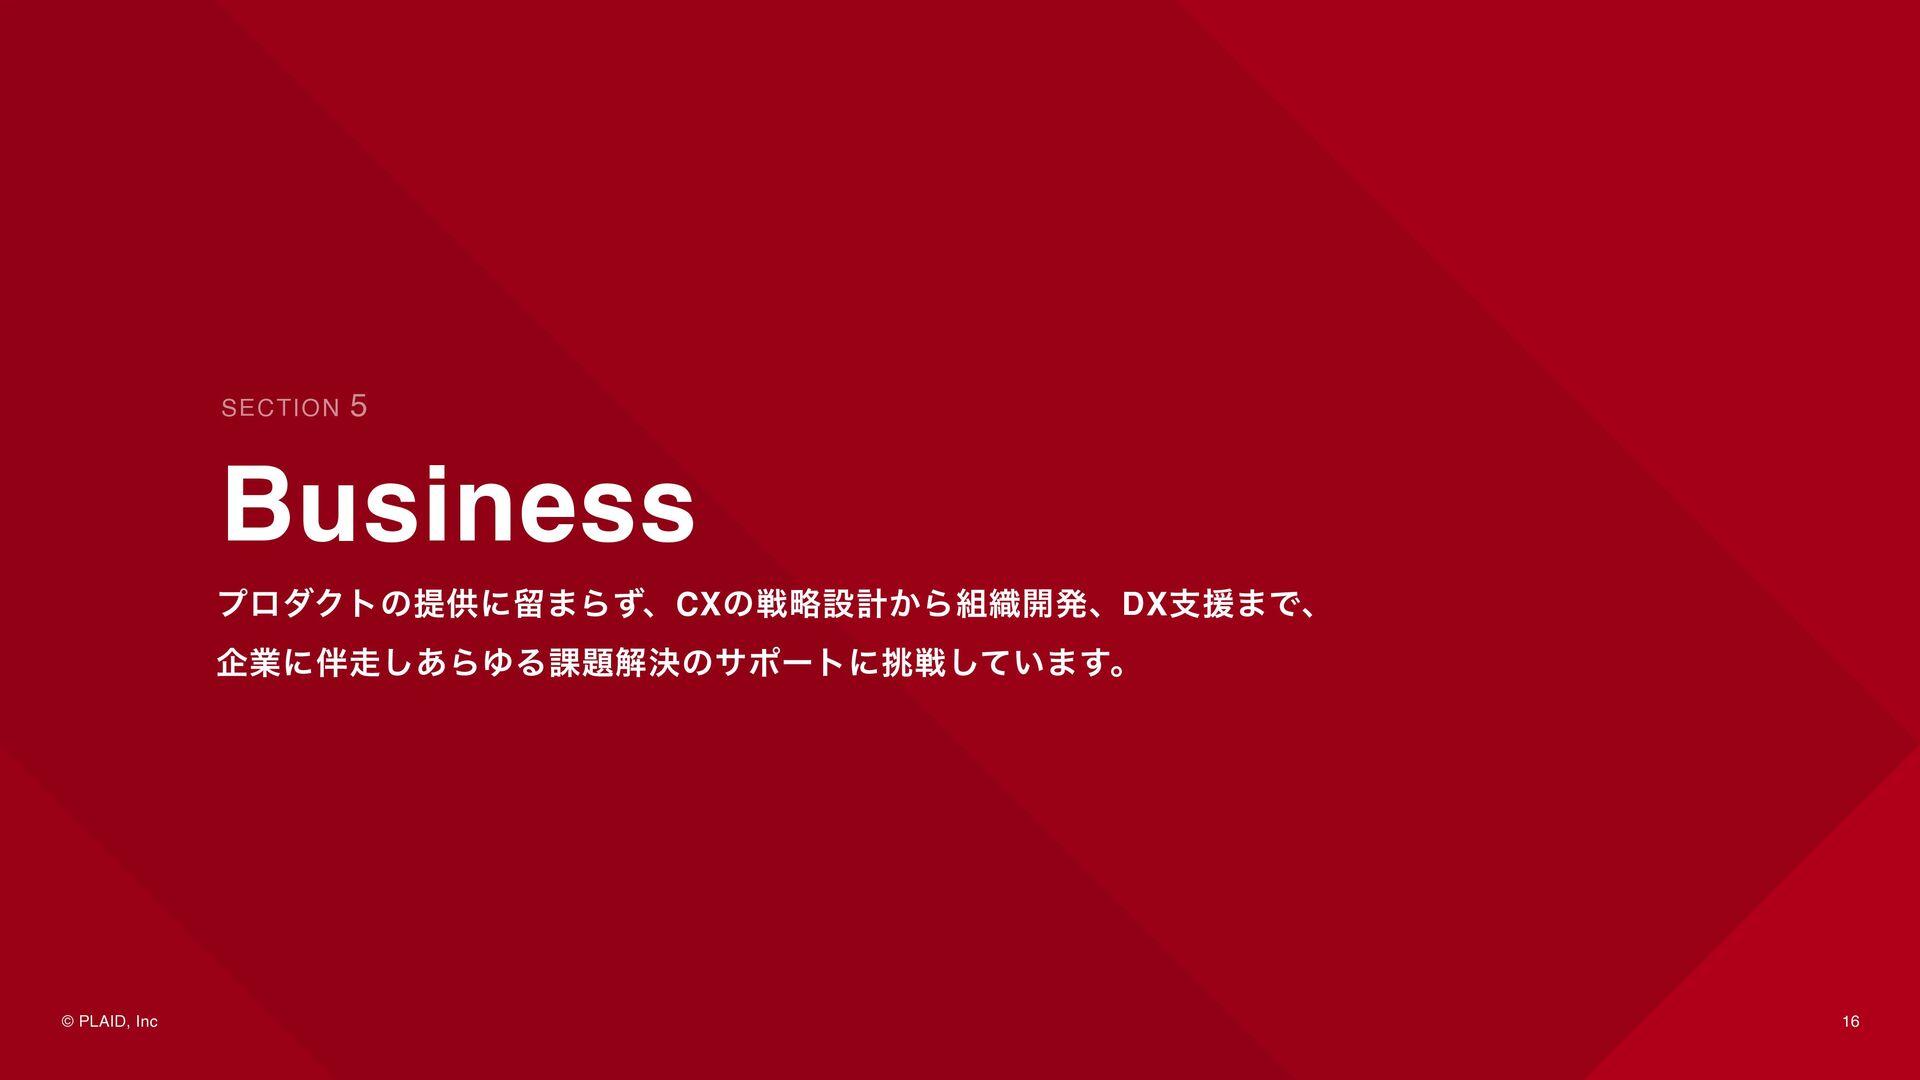 16 Business - KARTE © PLAID, Inc サイトやアプリの訪問顧客のリ...